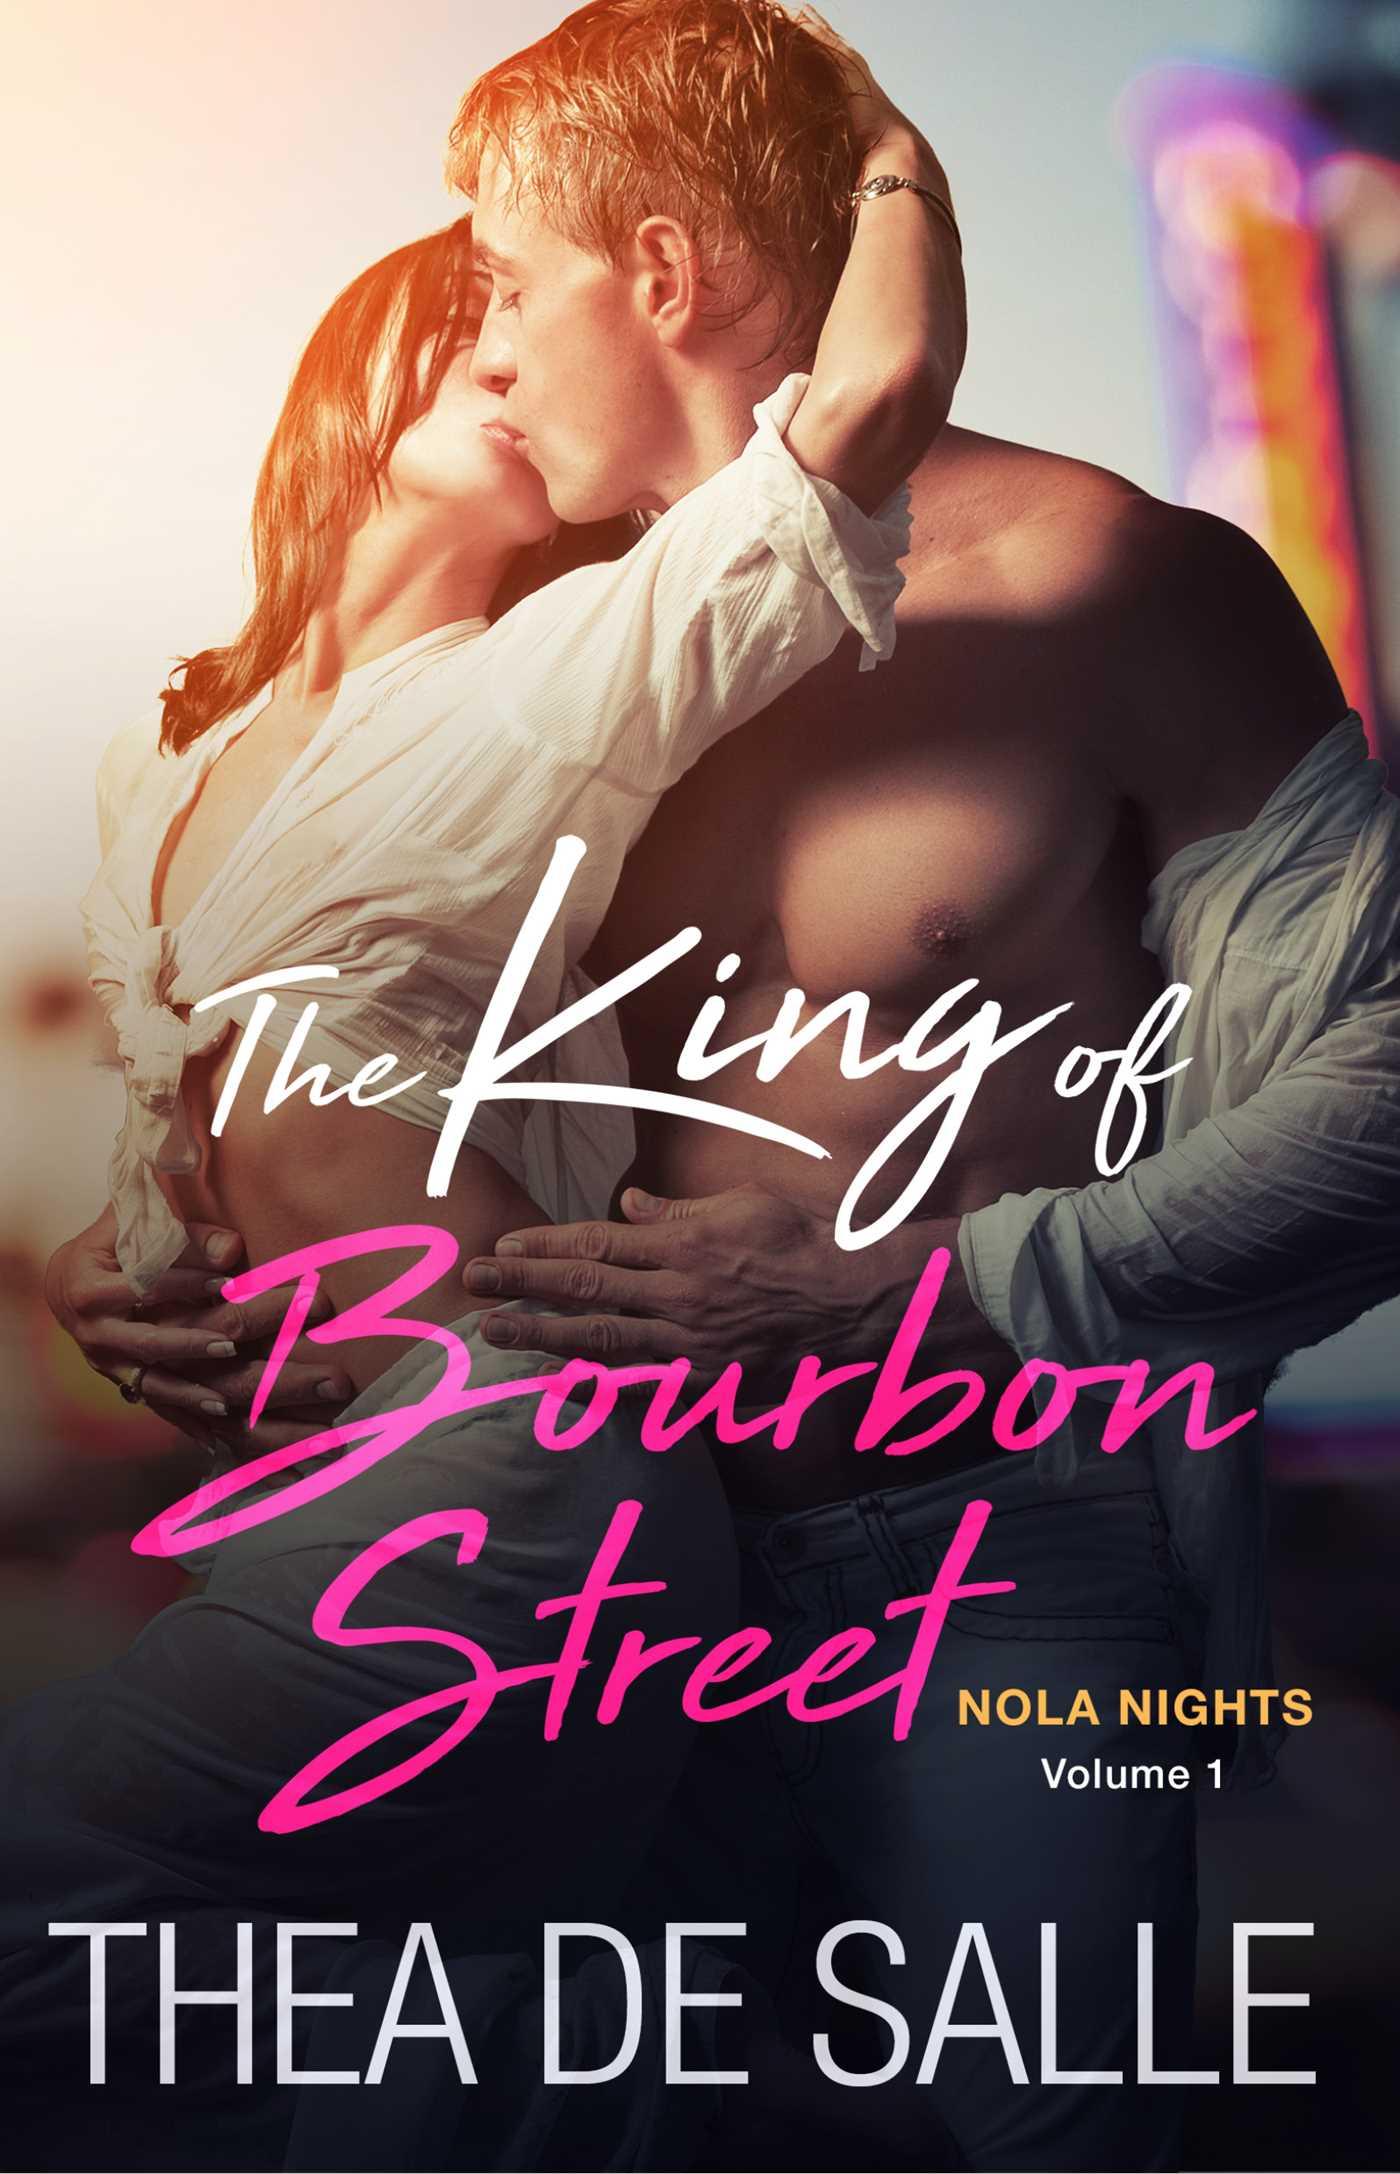 The king of bourbon street 9781501156076 hr